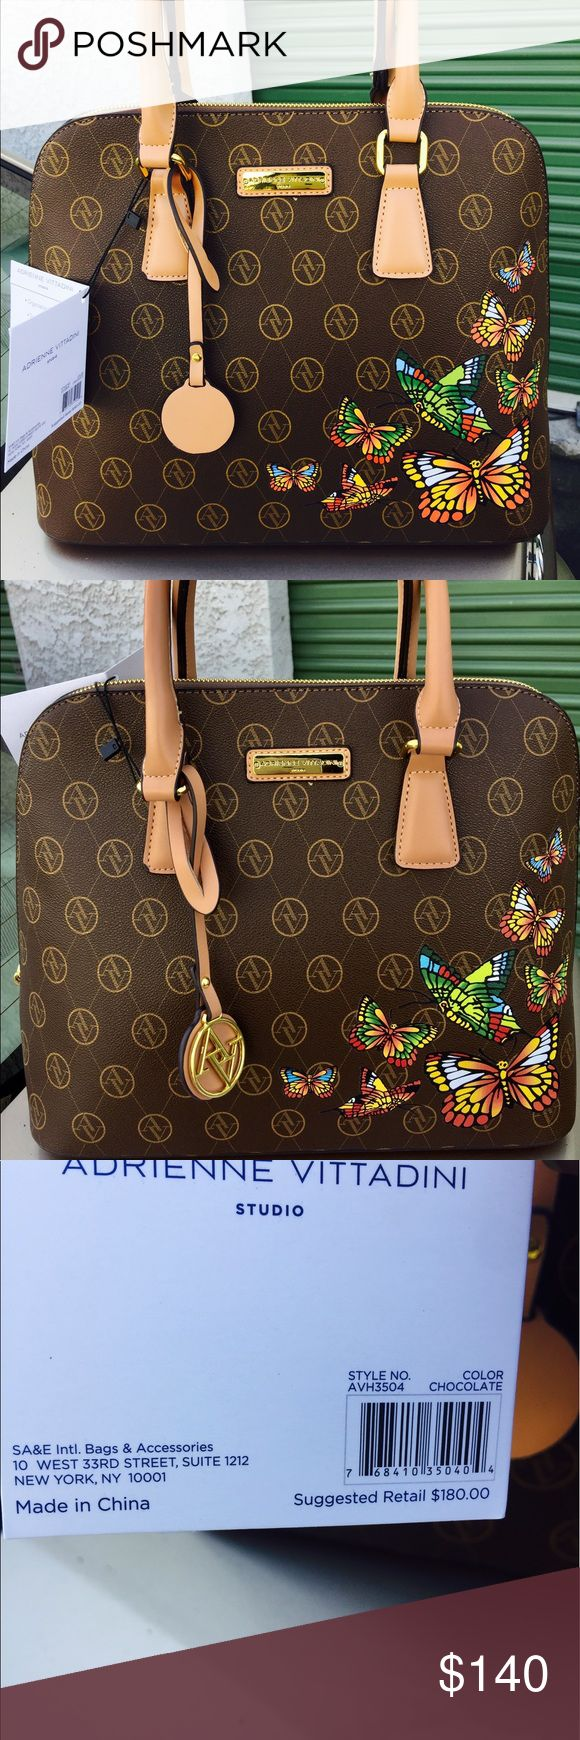 "Adrienne vittadini dome satchel bag Adrienne vittadini dome satchel bag . Two drop straps. Zipper closure. Dimensions are 13""X11""x5.5"" Adrienne Vittadini Bags Satchels"